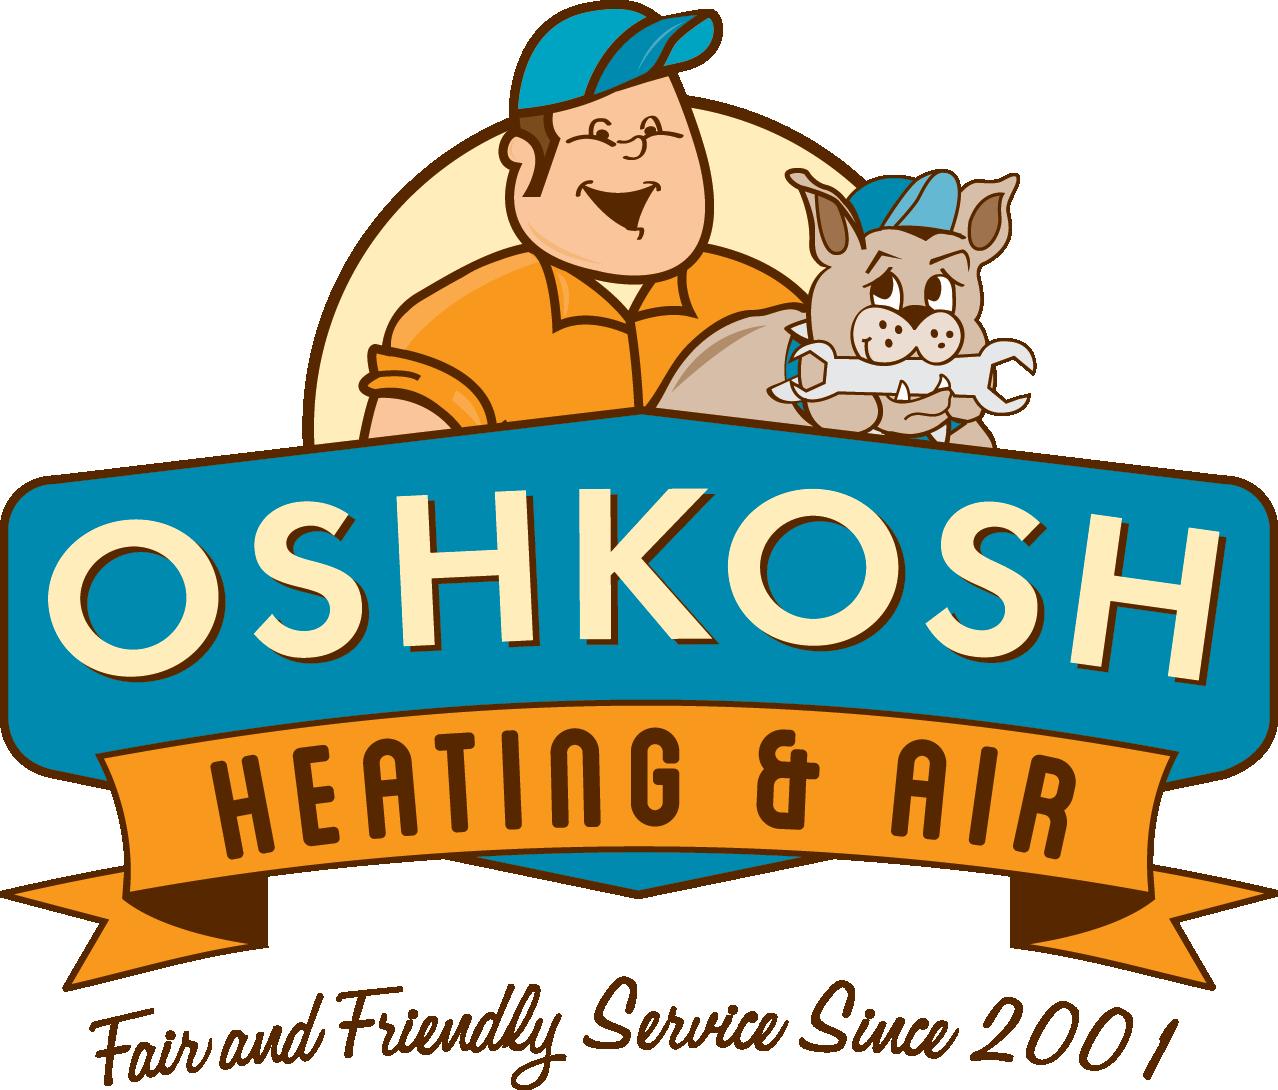 Oshkosh Heating Air Llc Reviews Oshkosh Wi Angie S List